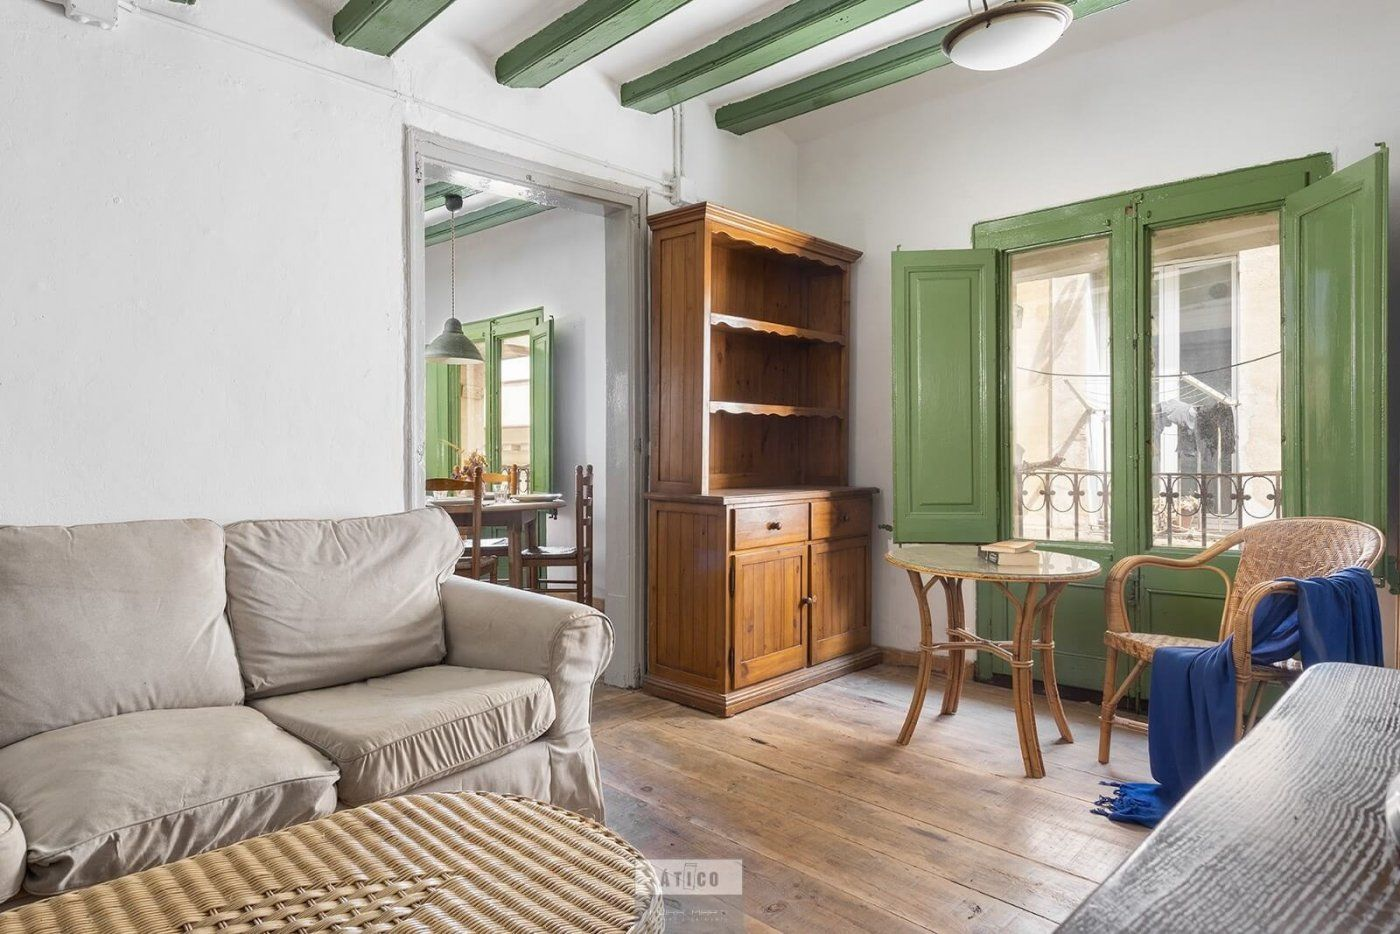 (Español) Espectacular piso en Ferran